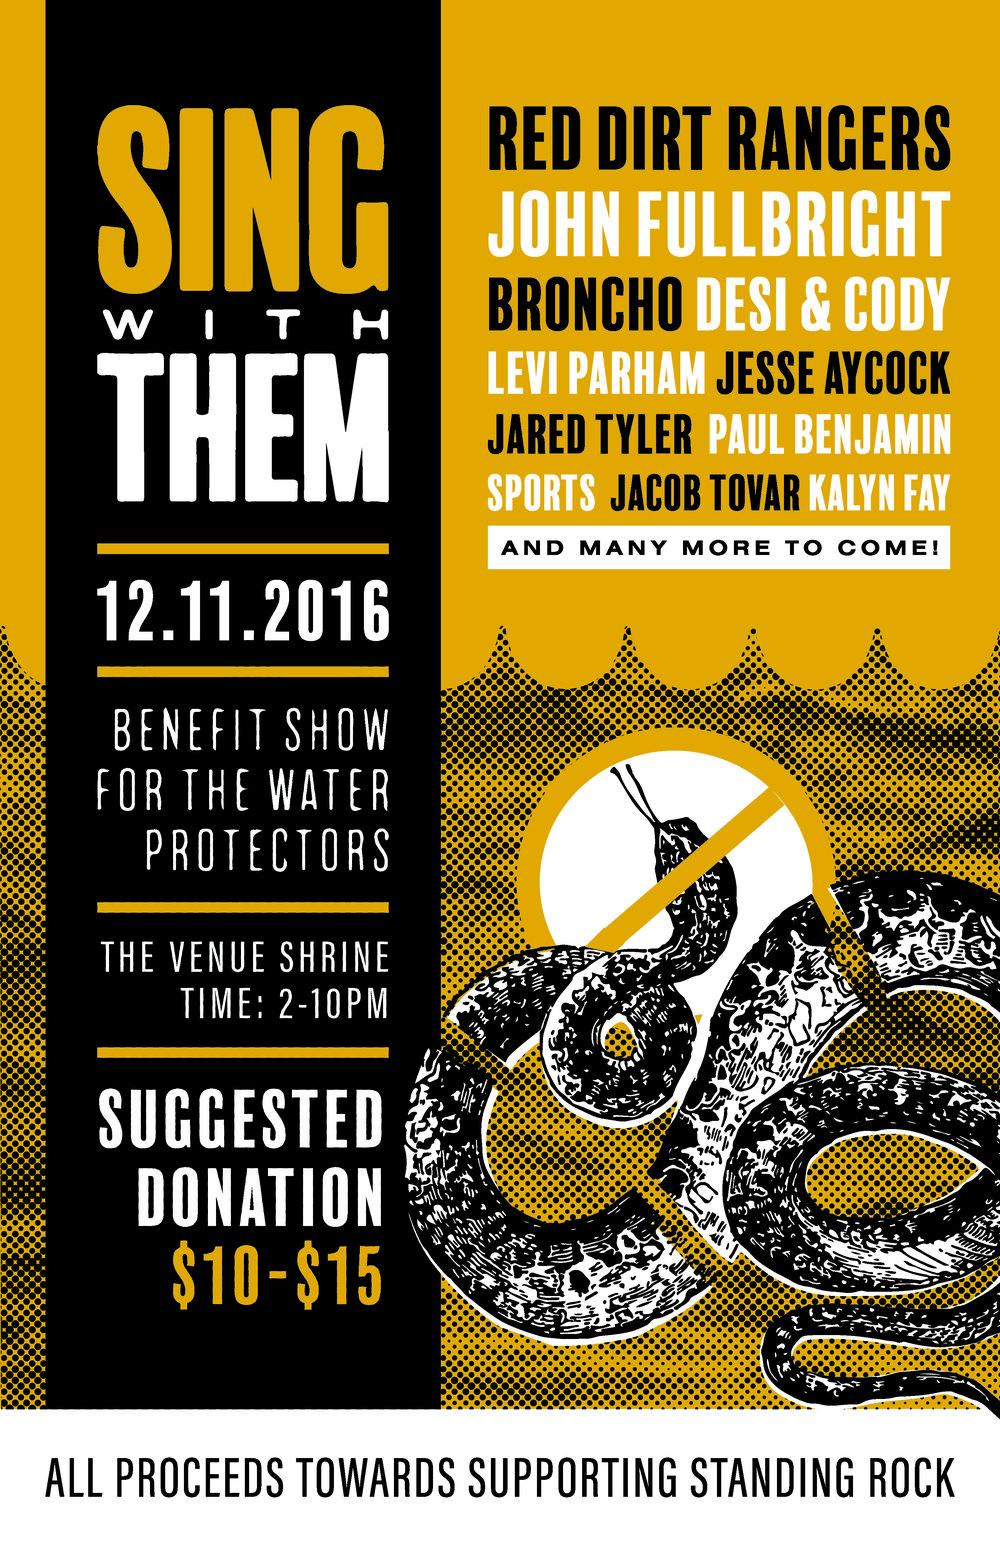 11-29-2016_Sterlin_SINGWITHTHEM_poster.jpg